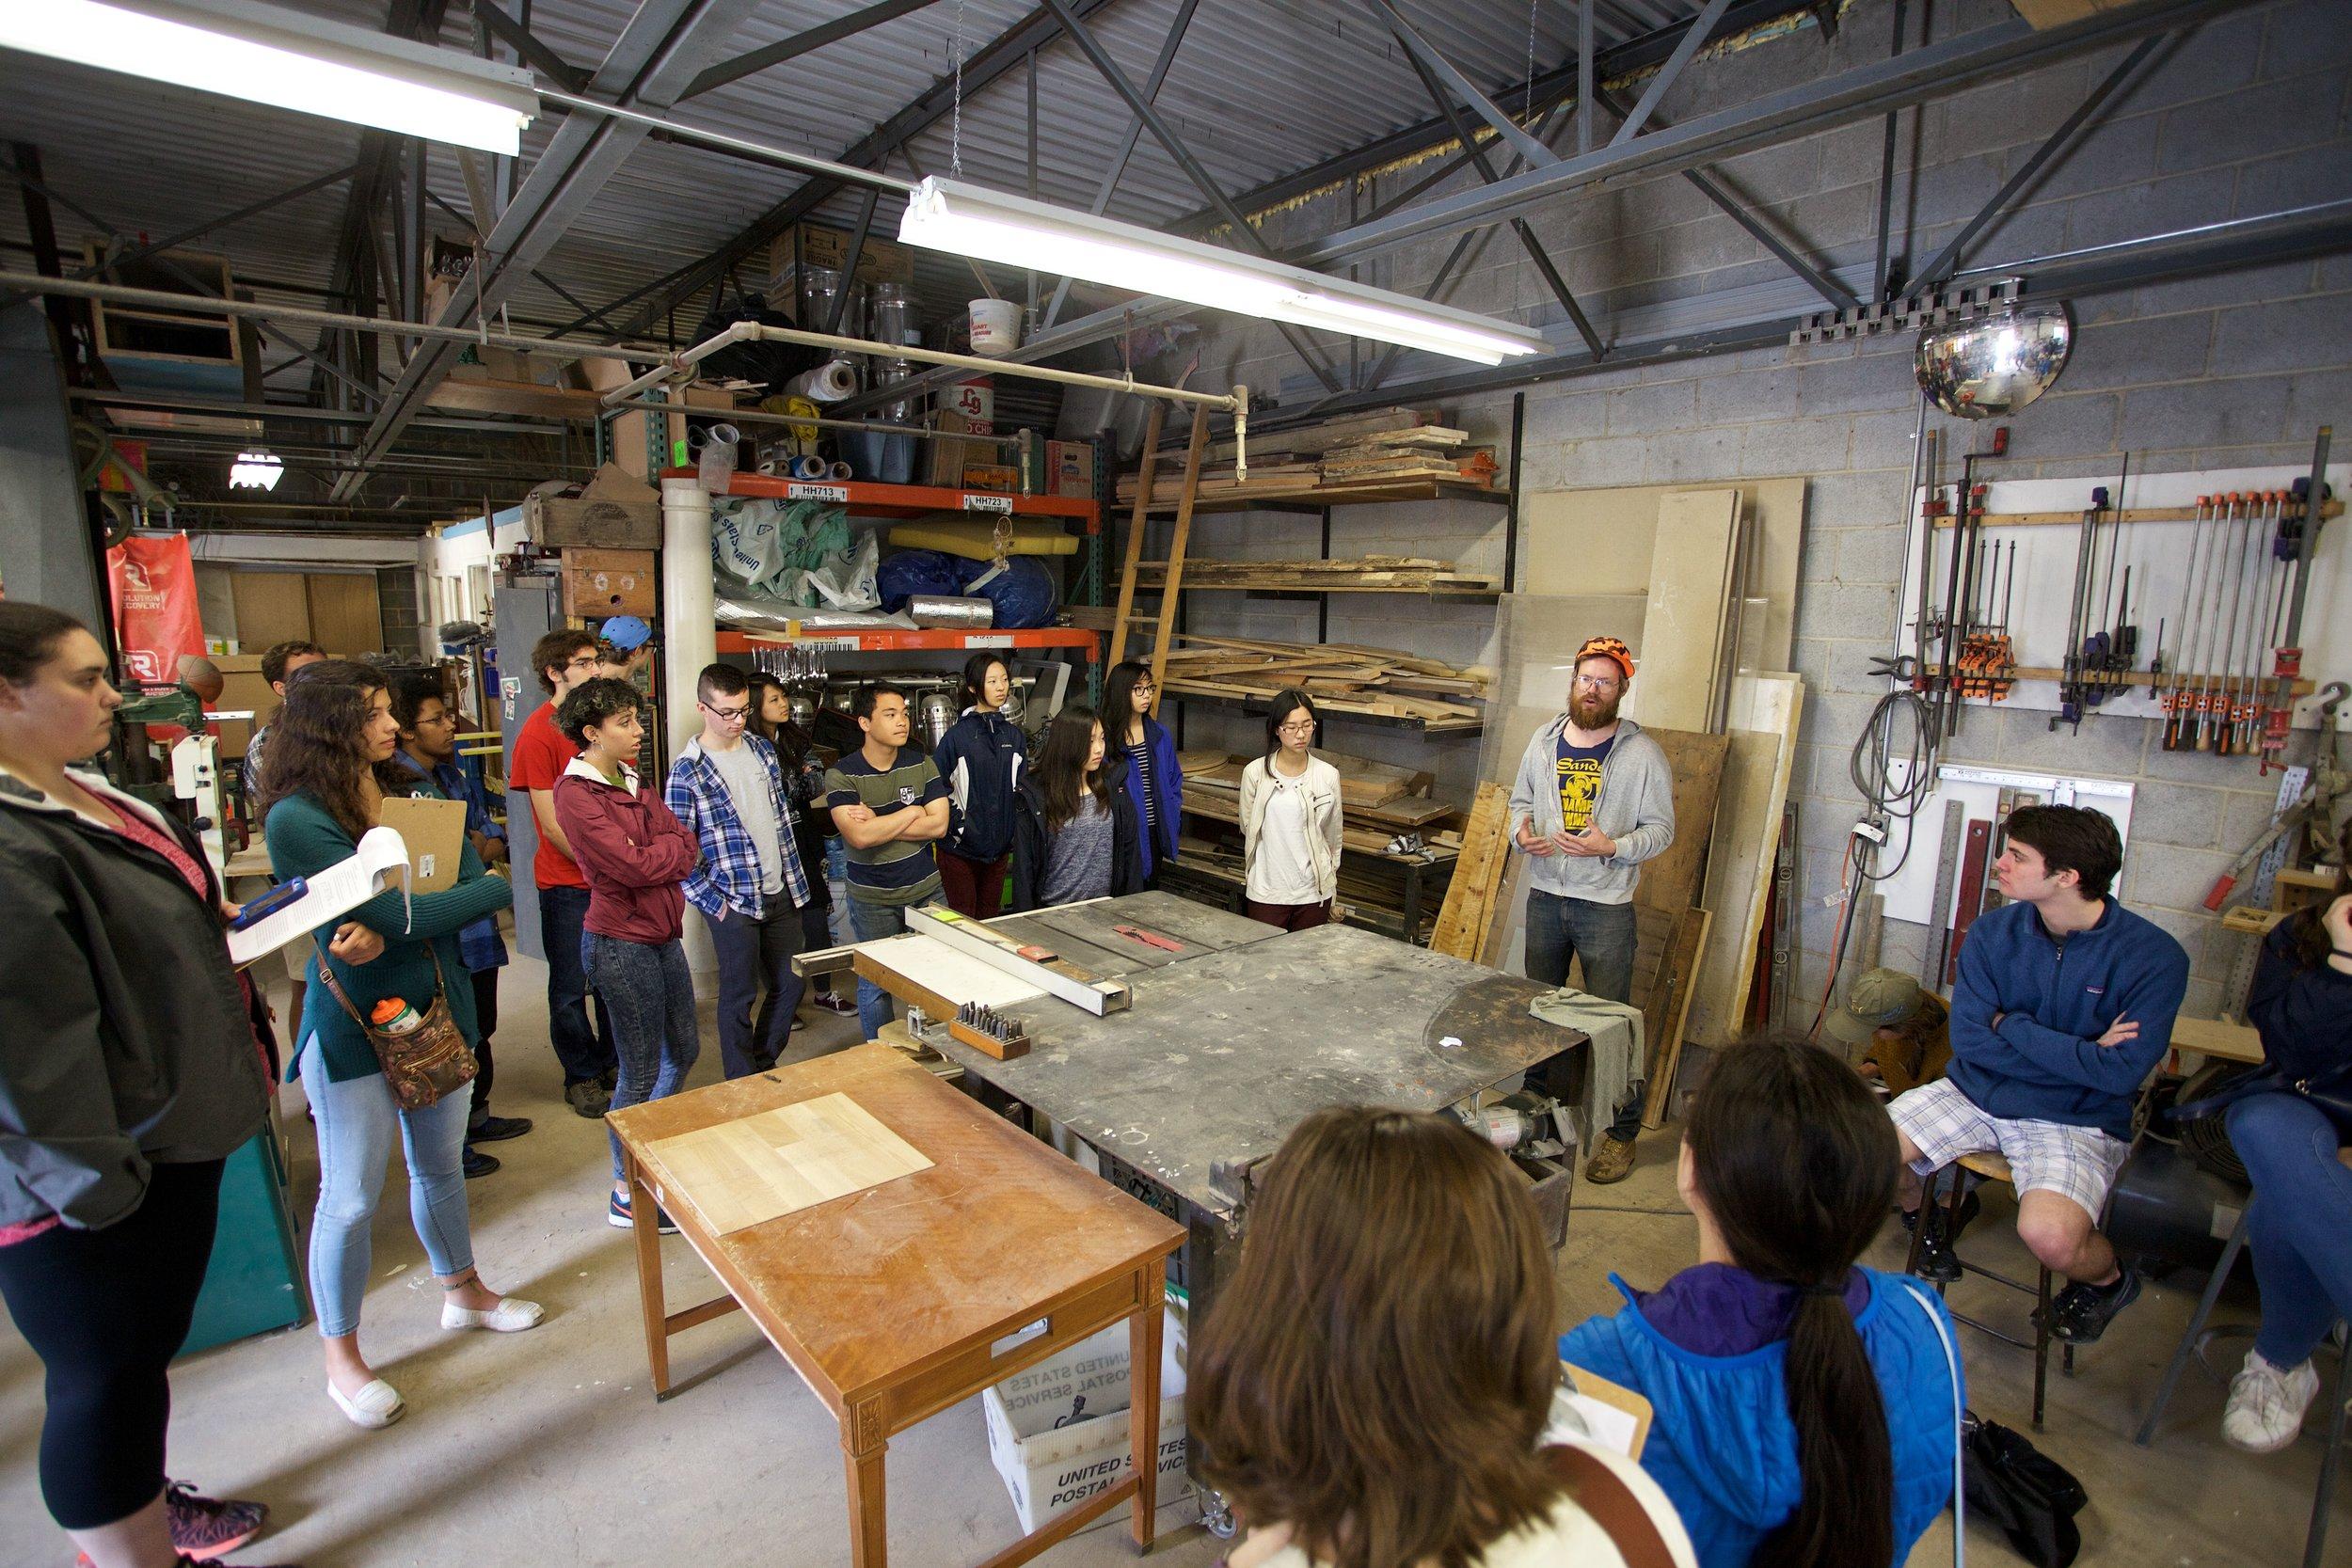 Philadelphia Freedoms: Class Site Visit to RAIR Philly (Photo by Caleb Eckert)